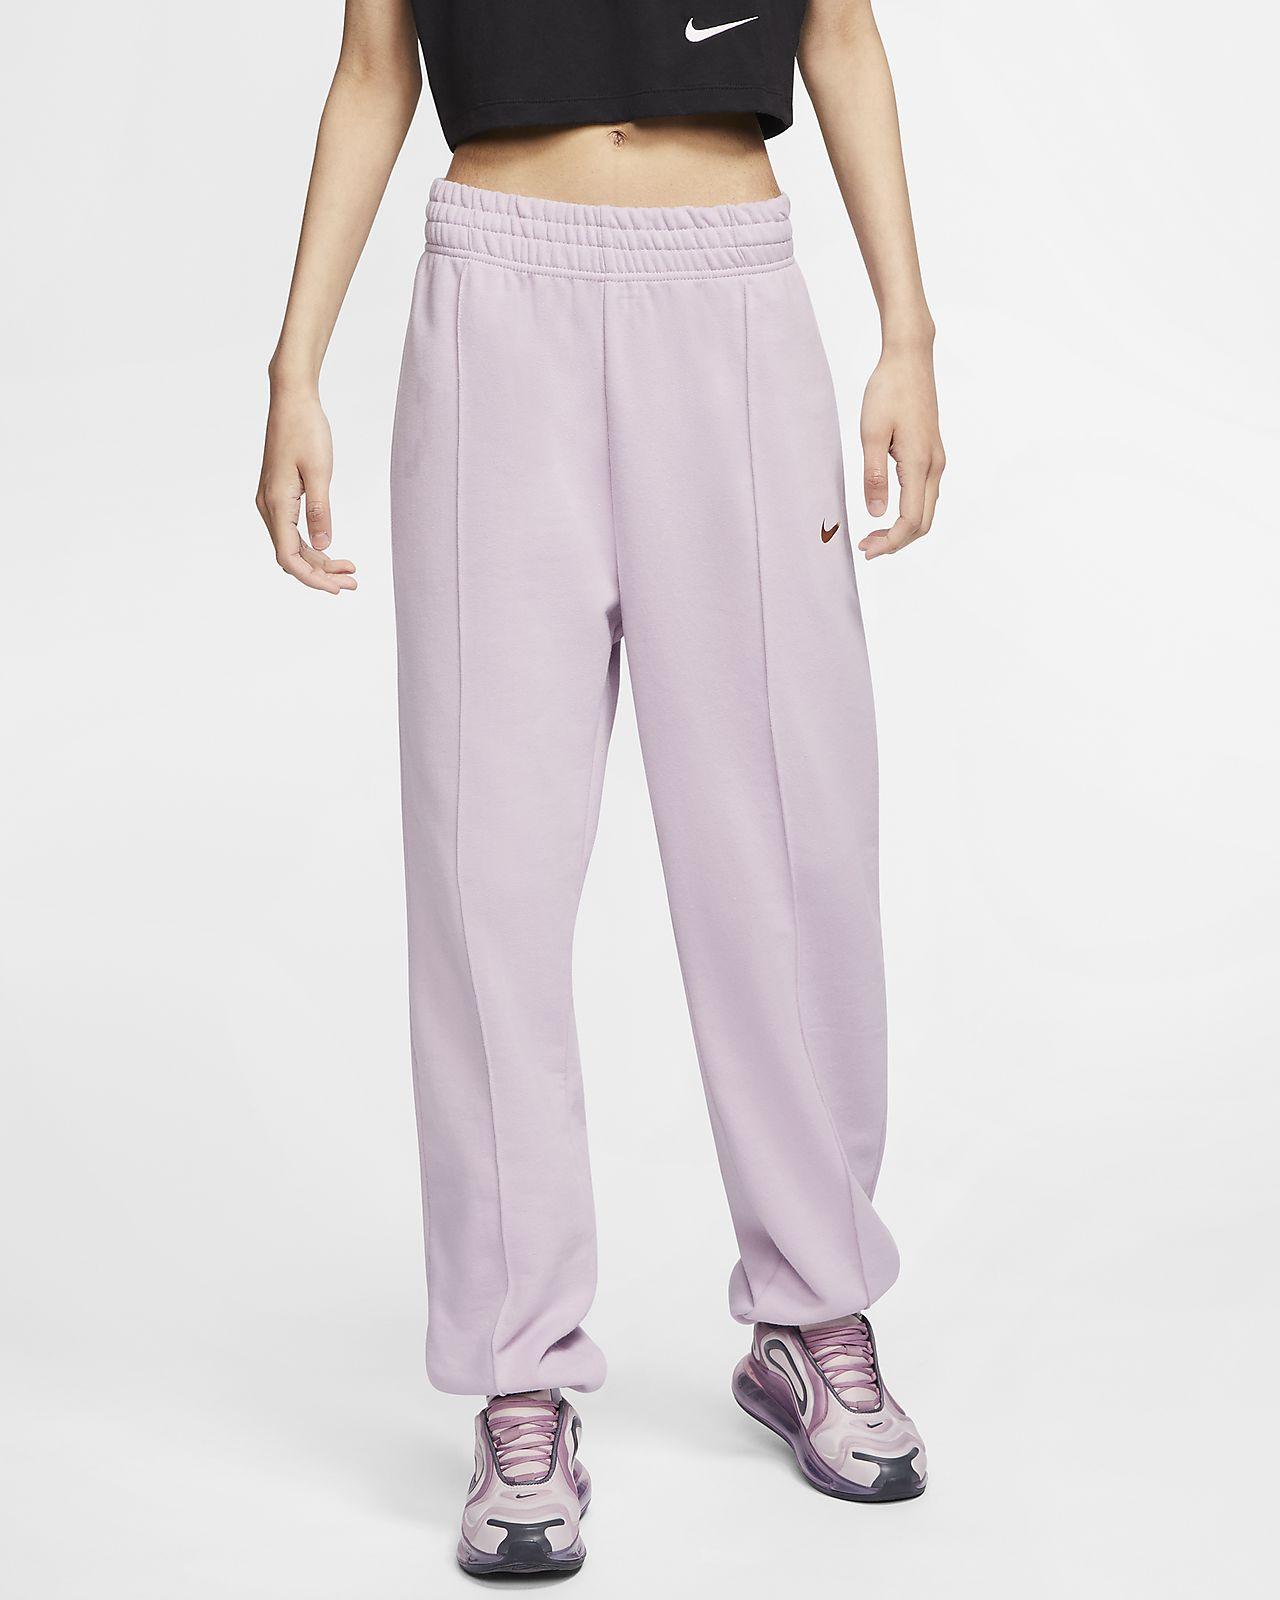 Pantaloni Nike Sportswear - Donna. Nike IT